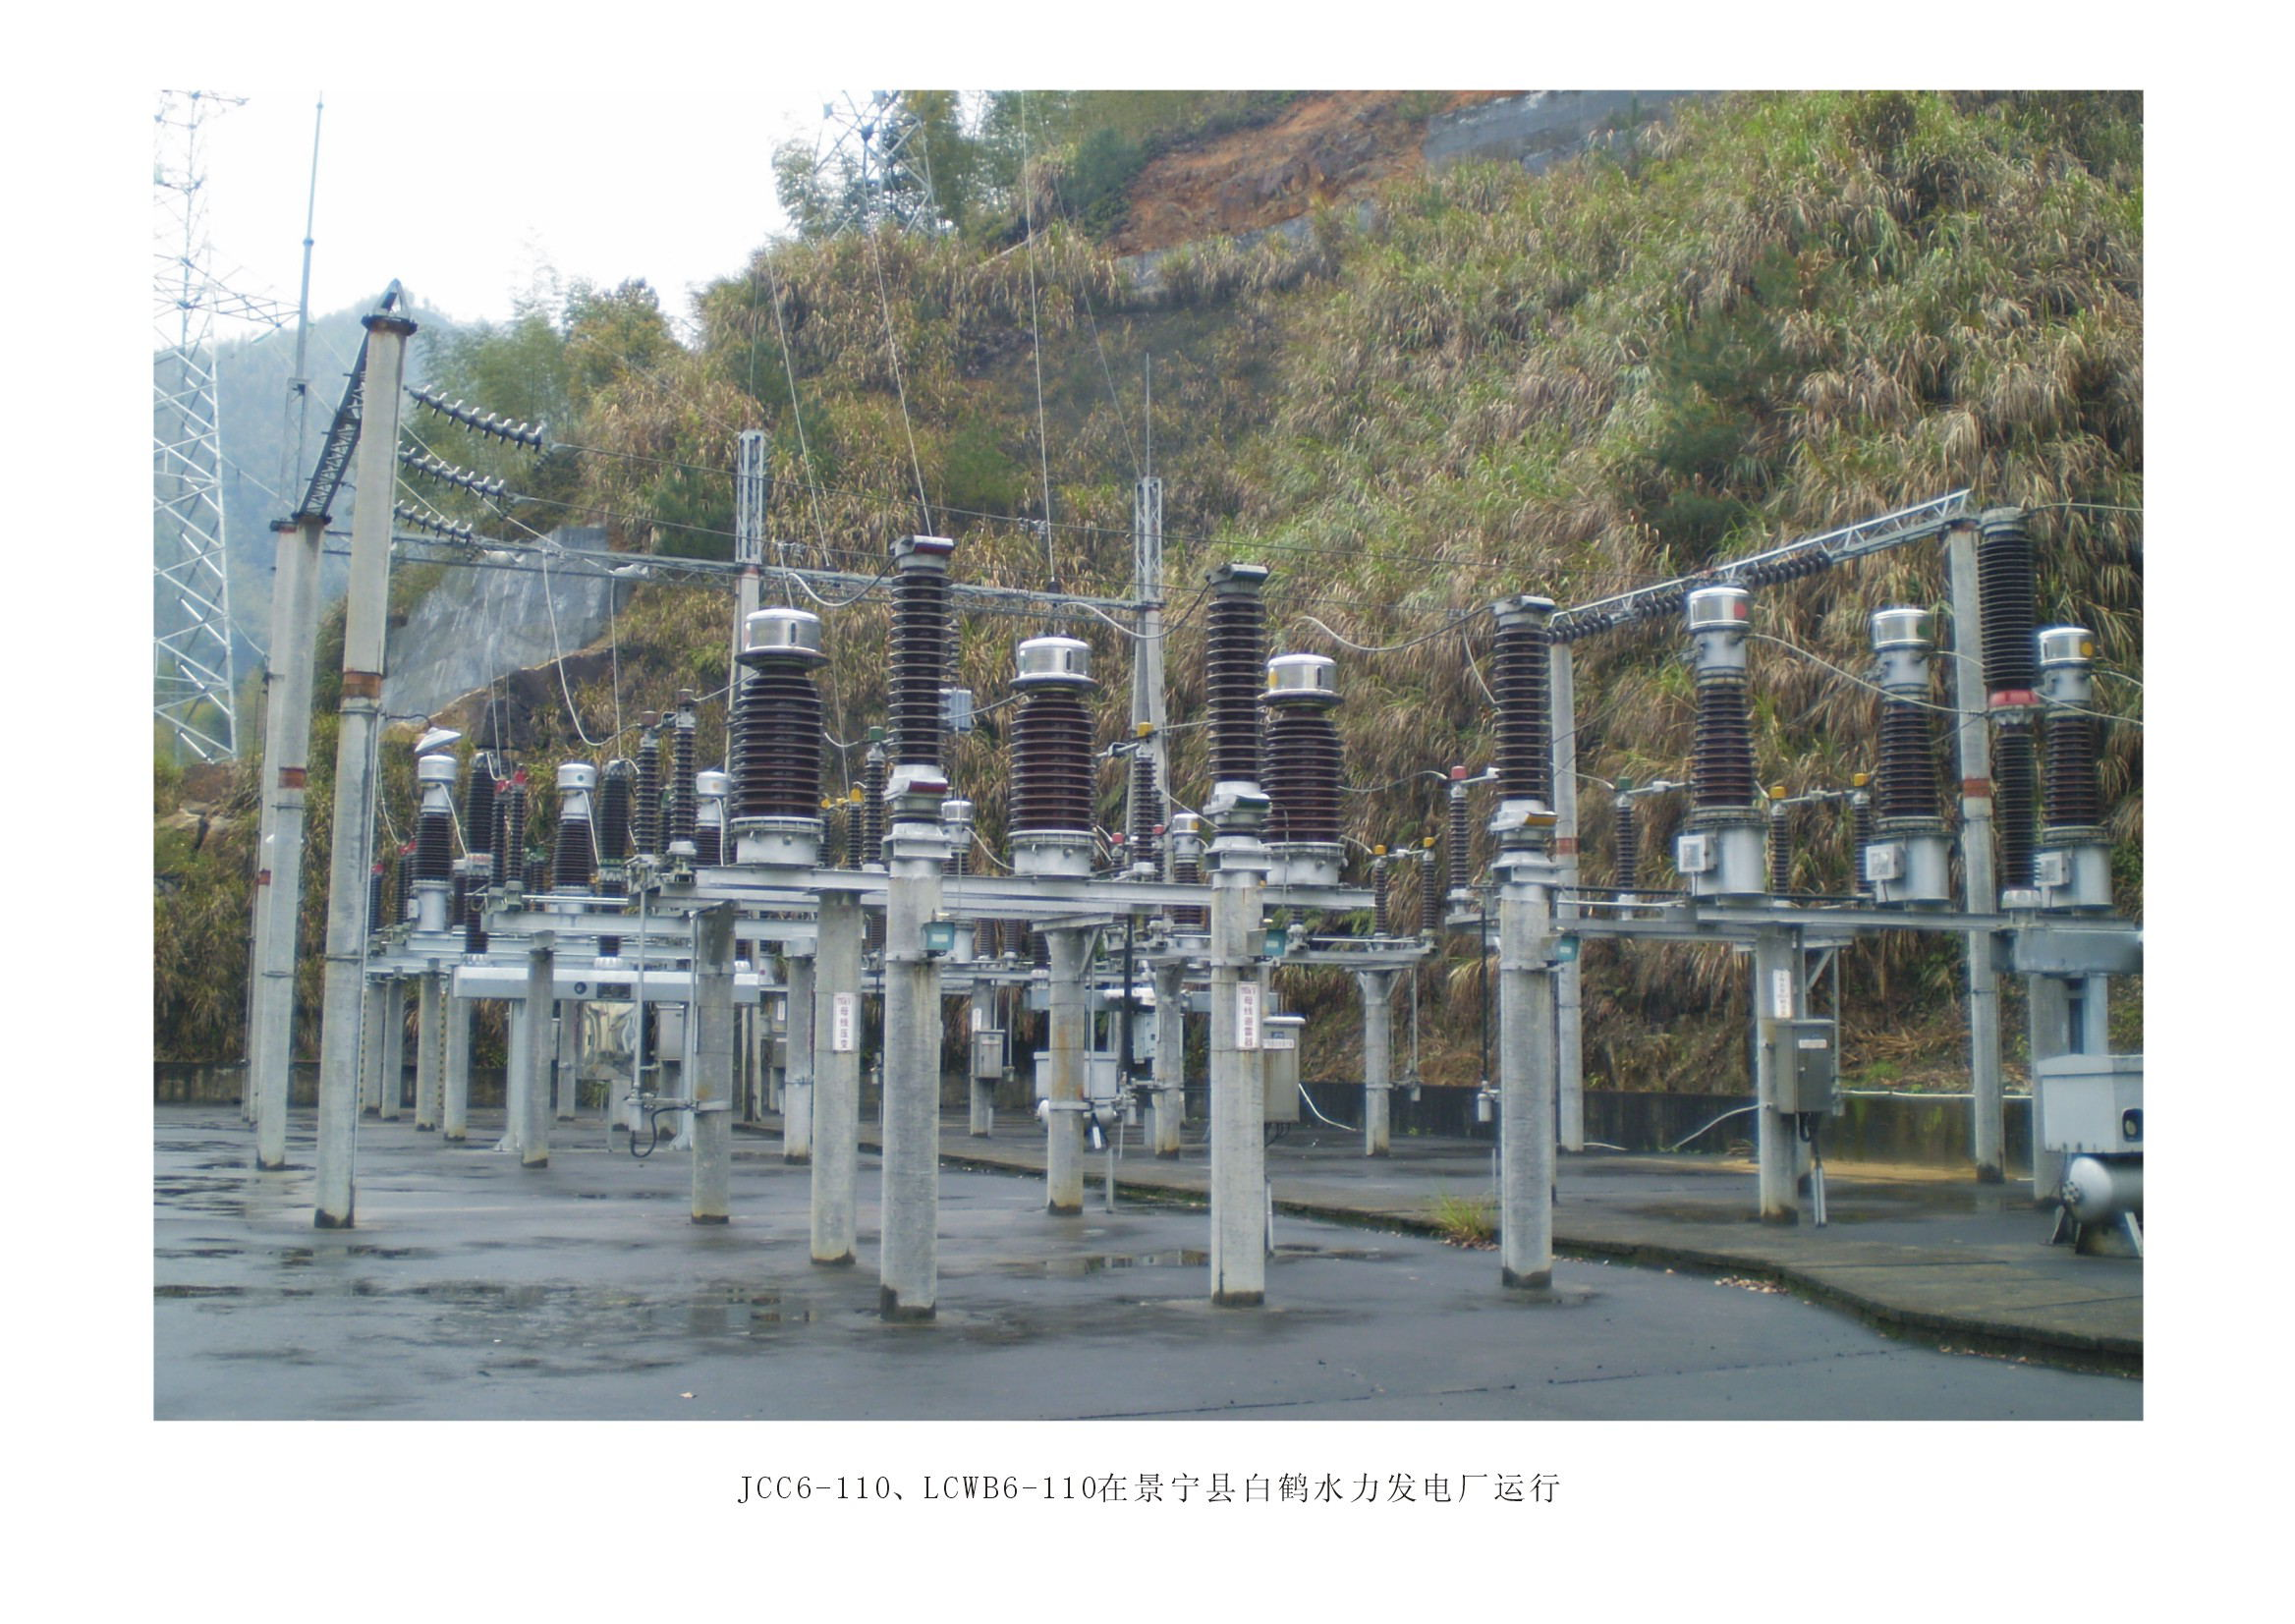 60JCC6-110、LCWB6-110在景宁县白鹤水力发电厂运行